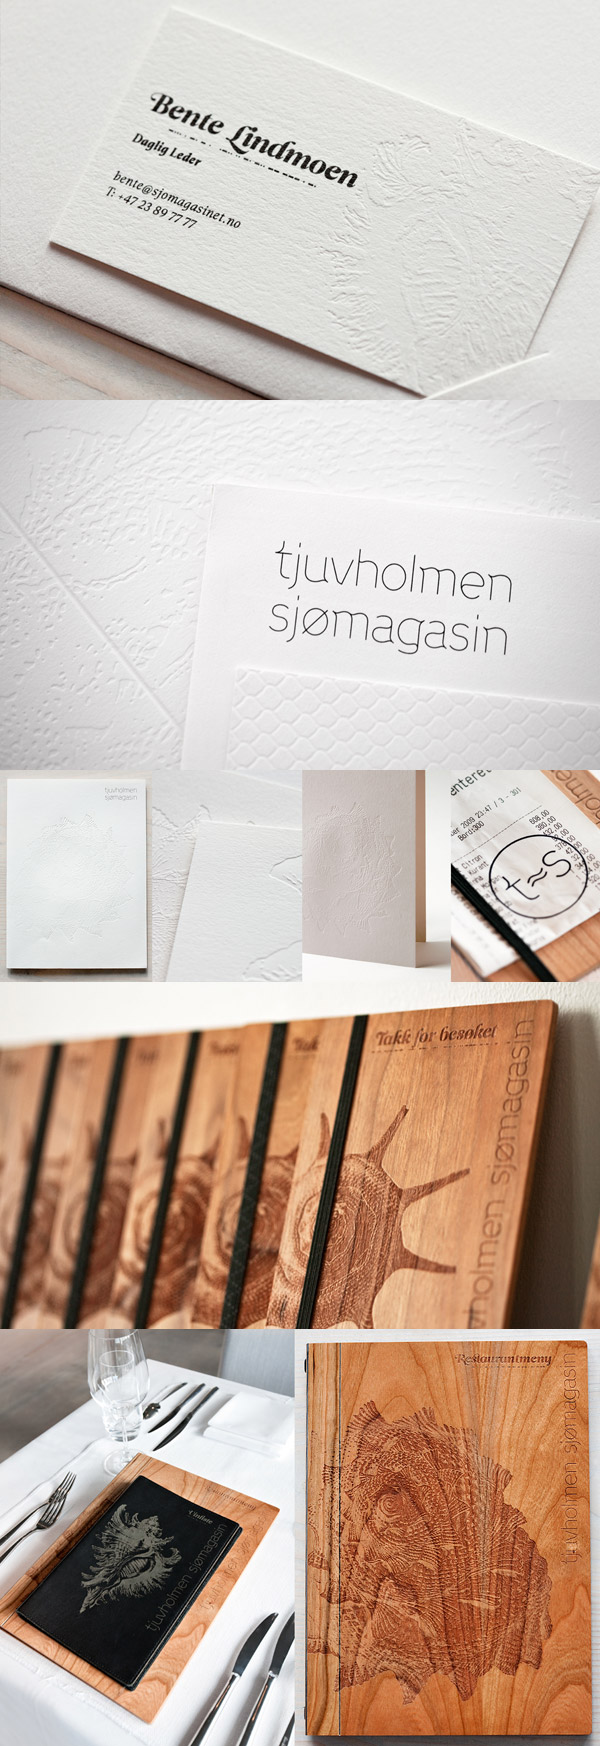 Tjuvholmen Sjomagasin Restaurant's Business Card & Brand Identity